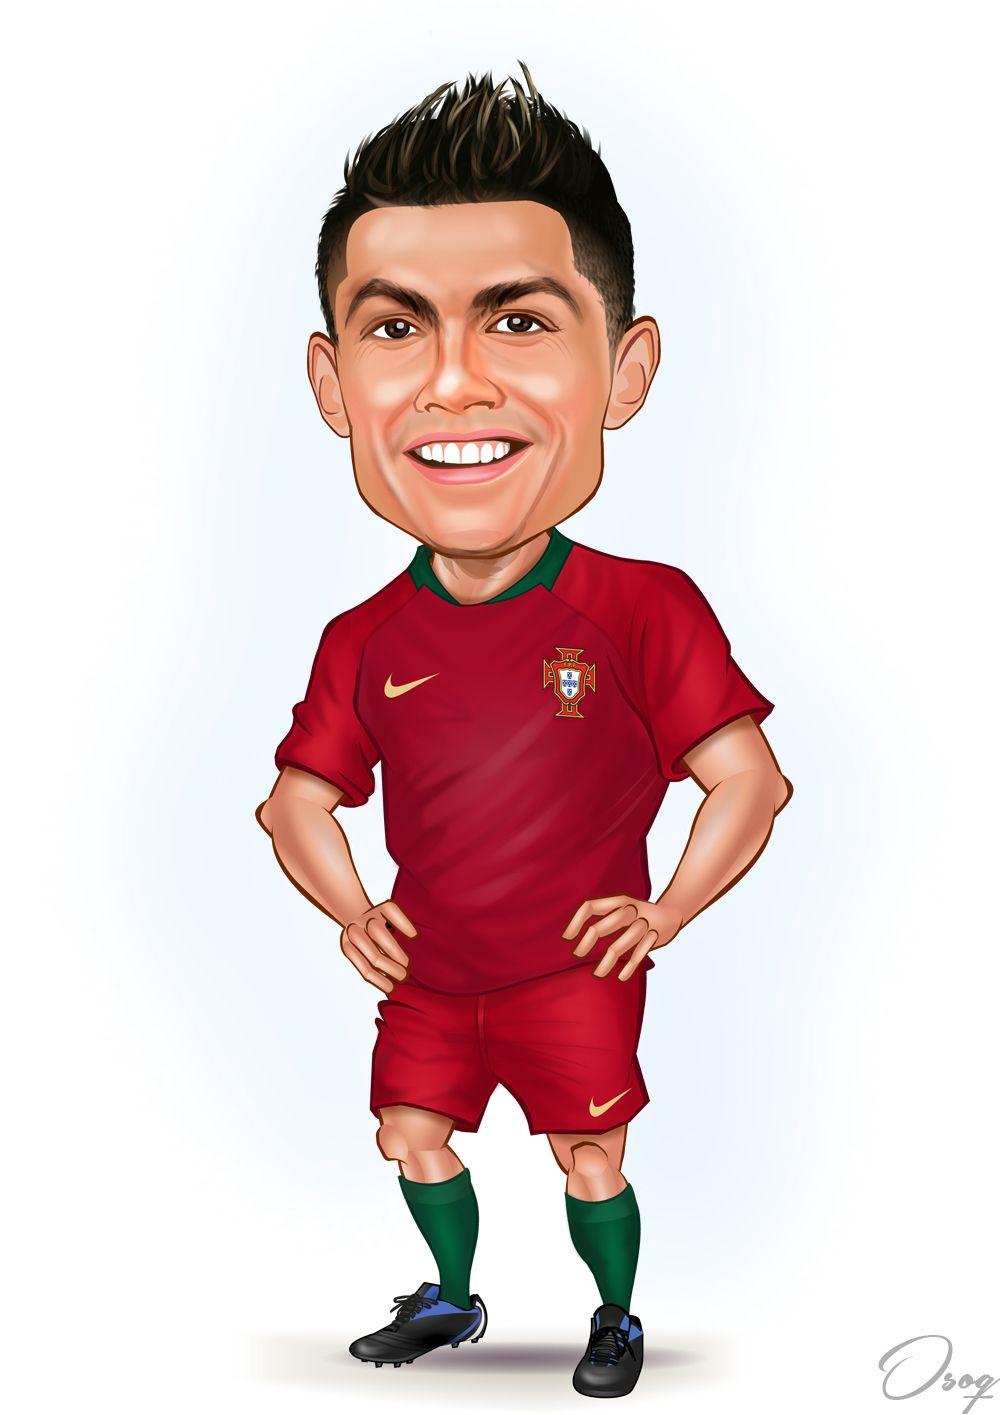 Soccer Cristiano Ronaldo Cartoon Cristiano Ronaldo Ronaldo Cartoon